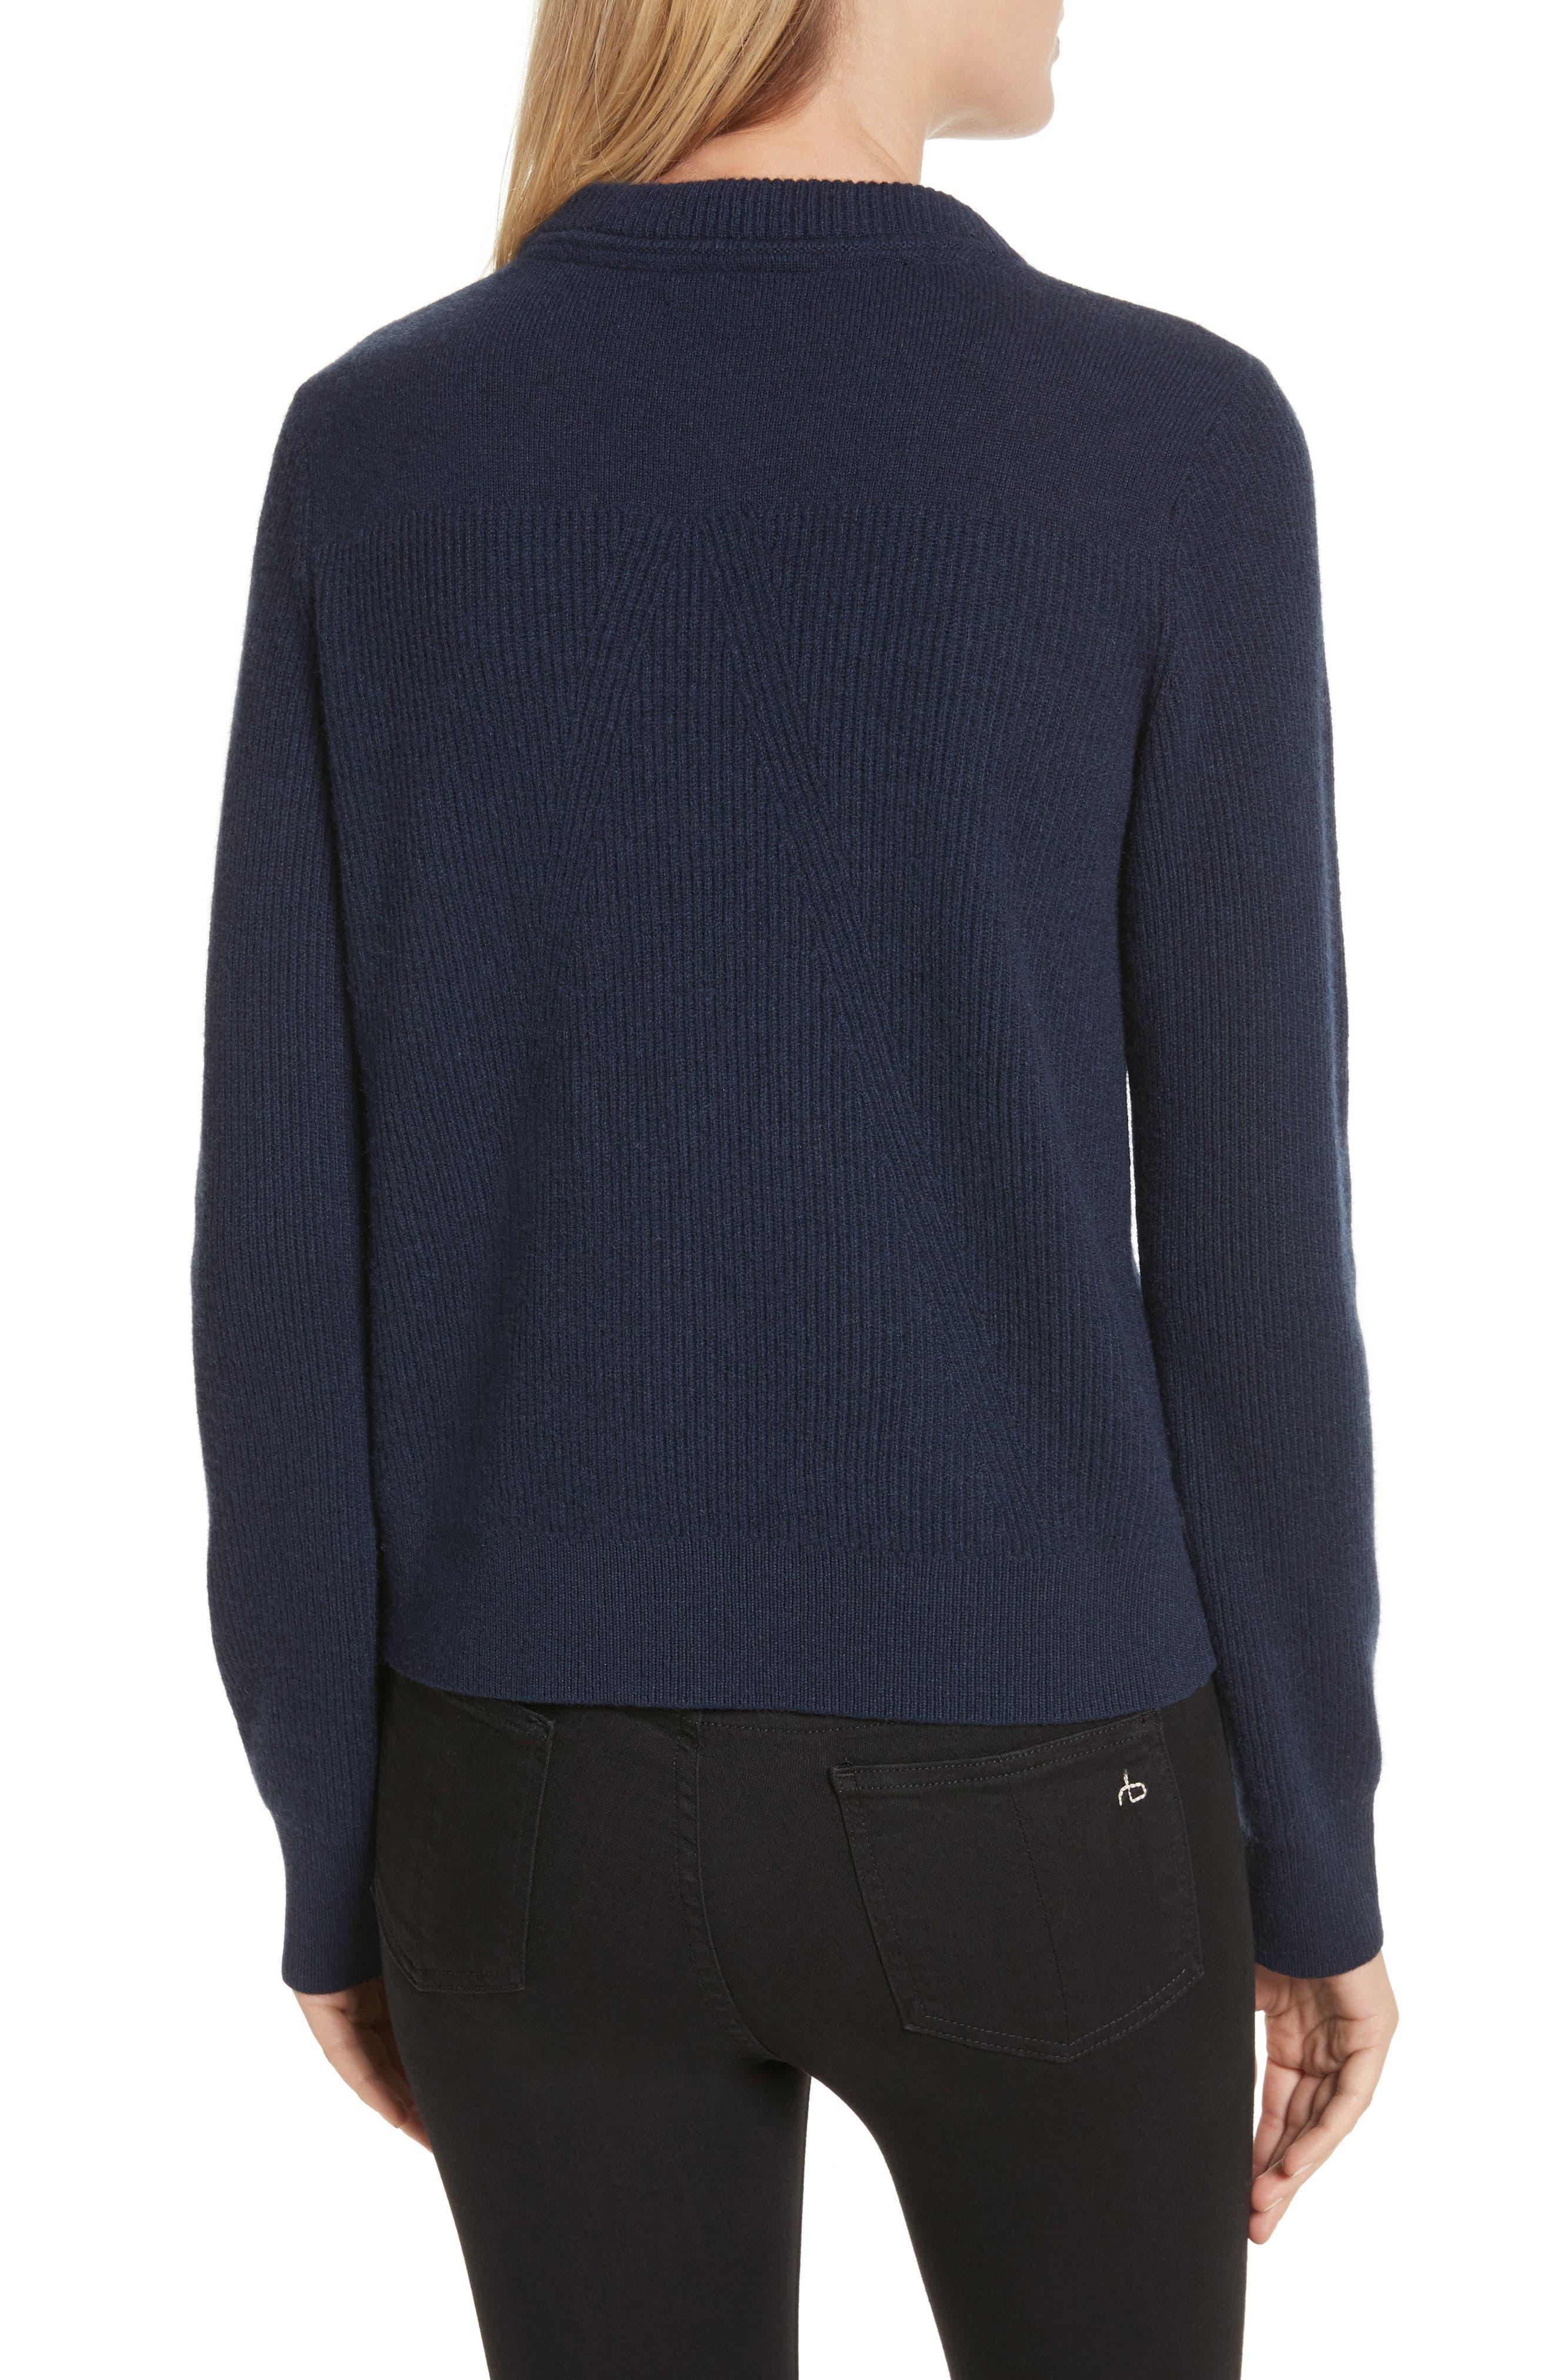 Ace Cashmere Crop Sweater,                             Alternate thumbnail 2, color,                             410